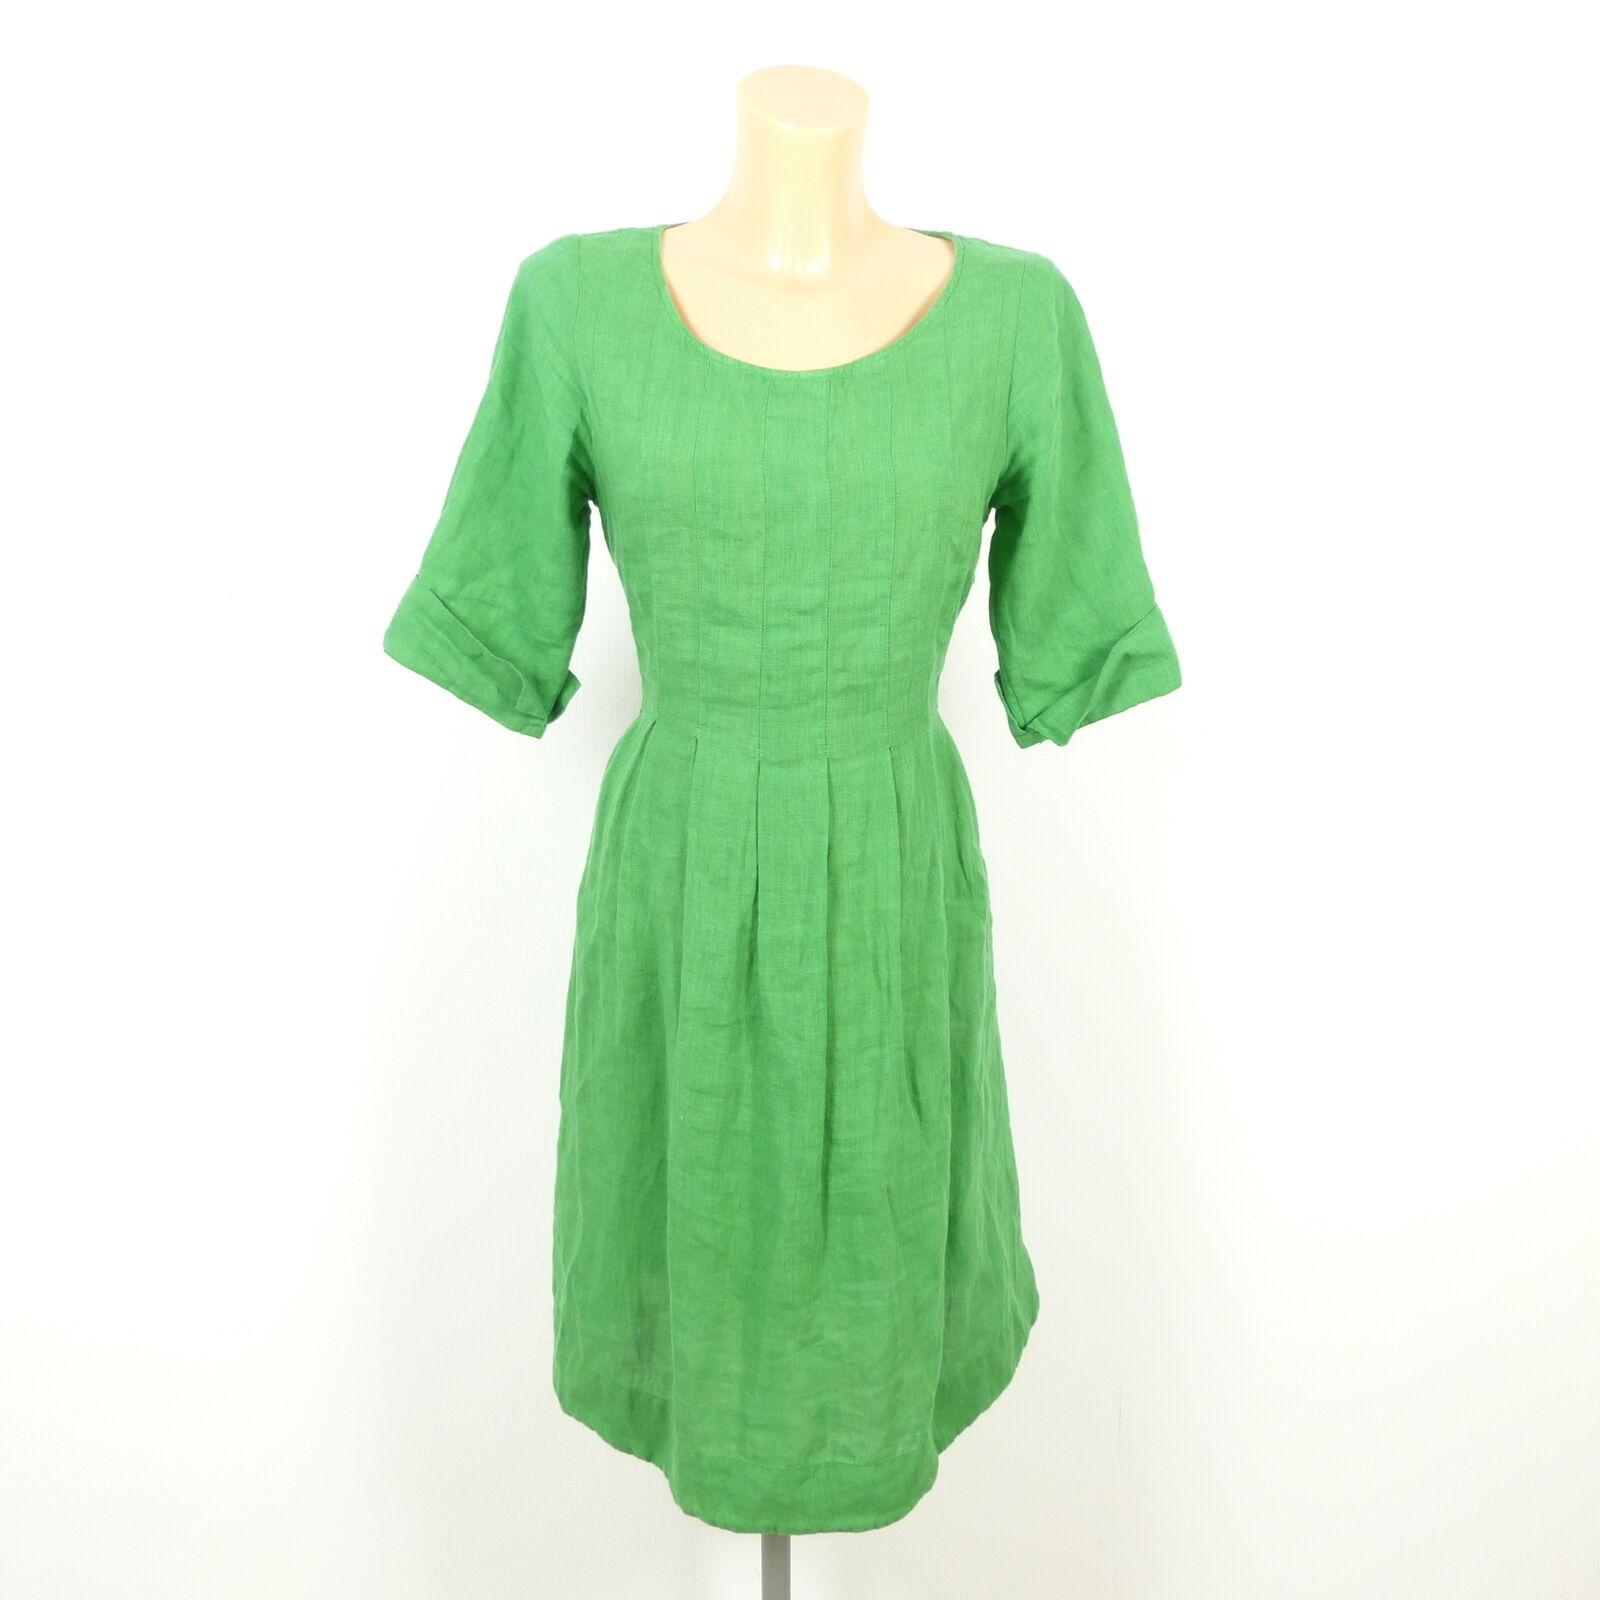 DEERBERG Kleid Dress Damen Tunika Bluse Grün Leinen Gr. S 36